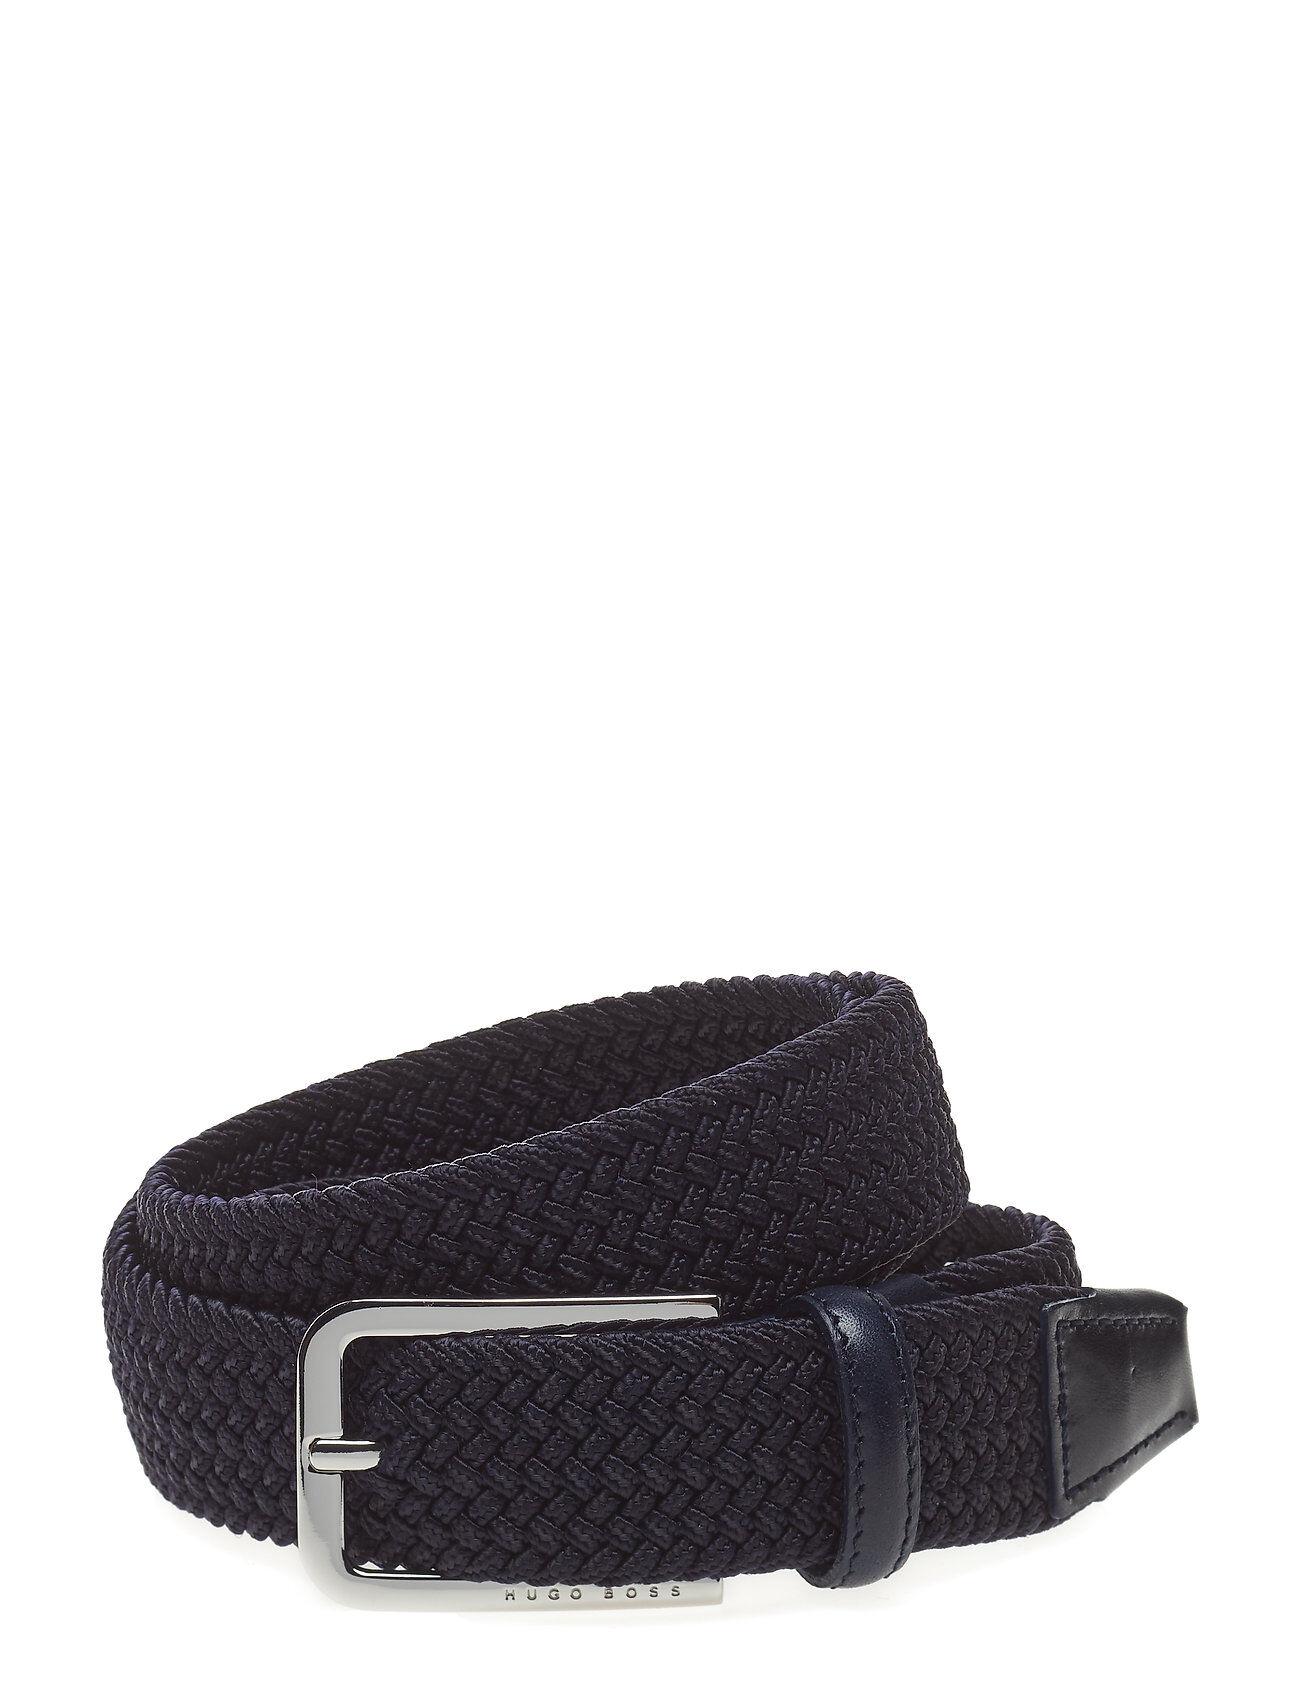 Image of Boss Clorio_sz30 Accessories Belts Braided Belt Sininen